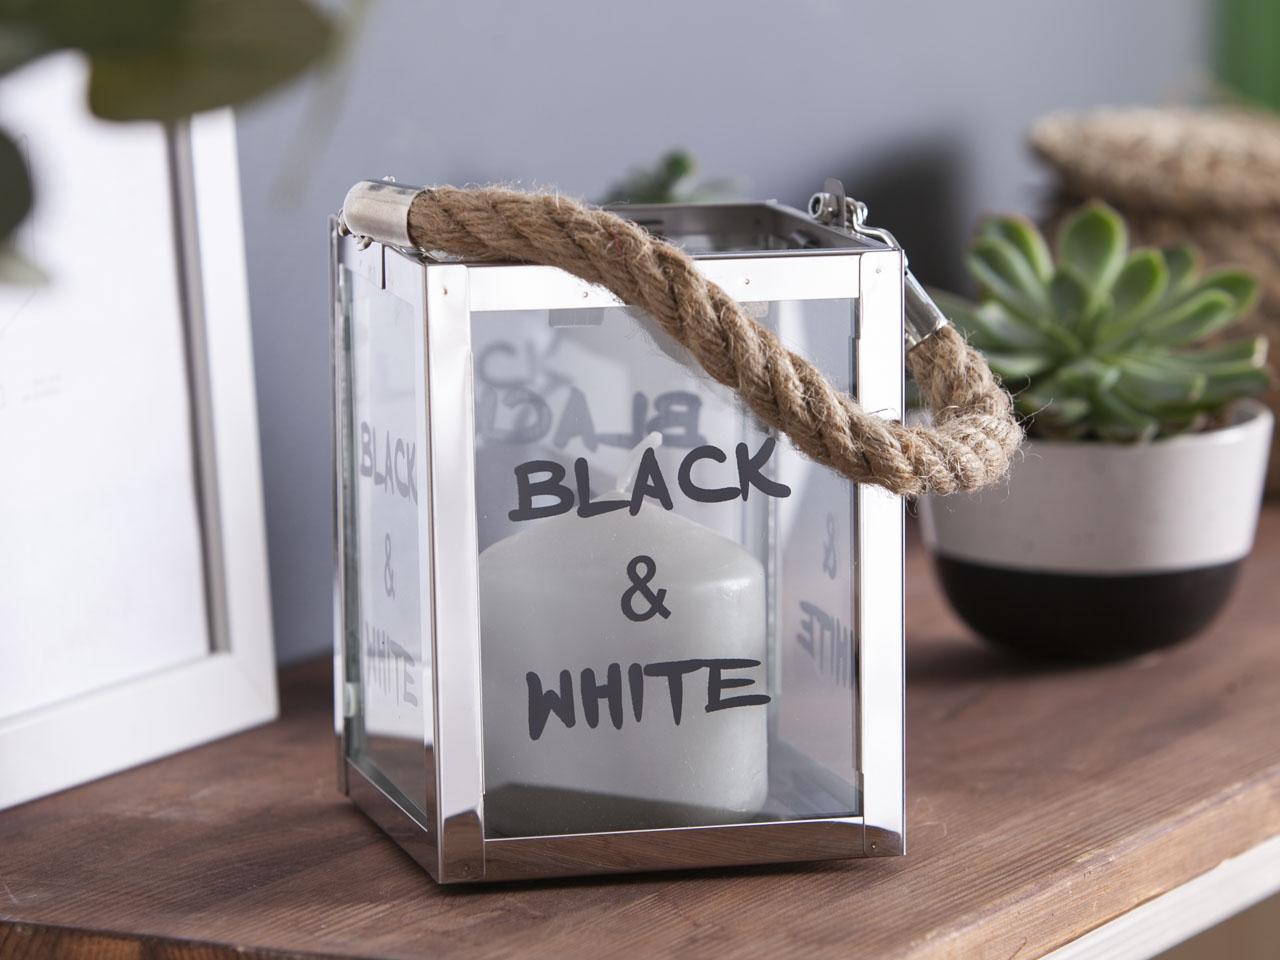 Latarenka / latarnia / lampion ozdobny szklany / metalowy Altom Design Black N White 11x15 cm